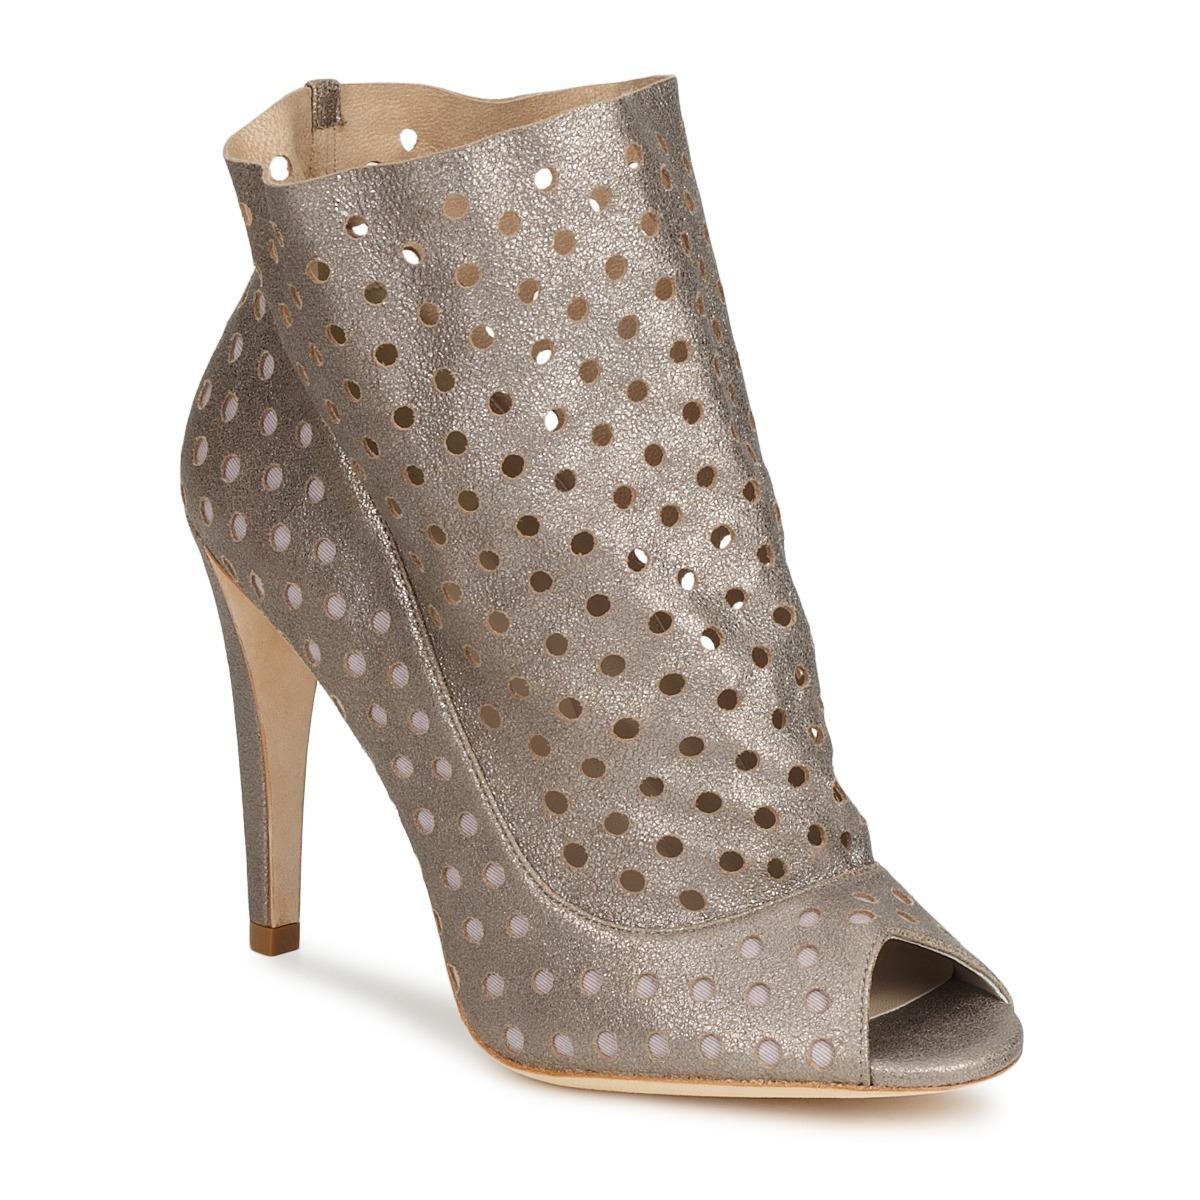 Bourne RITA Silbern - Kostenloser Versand bei Spartoode ! - Schuhe Low Boots Damen 115,20 €